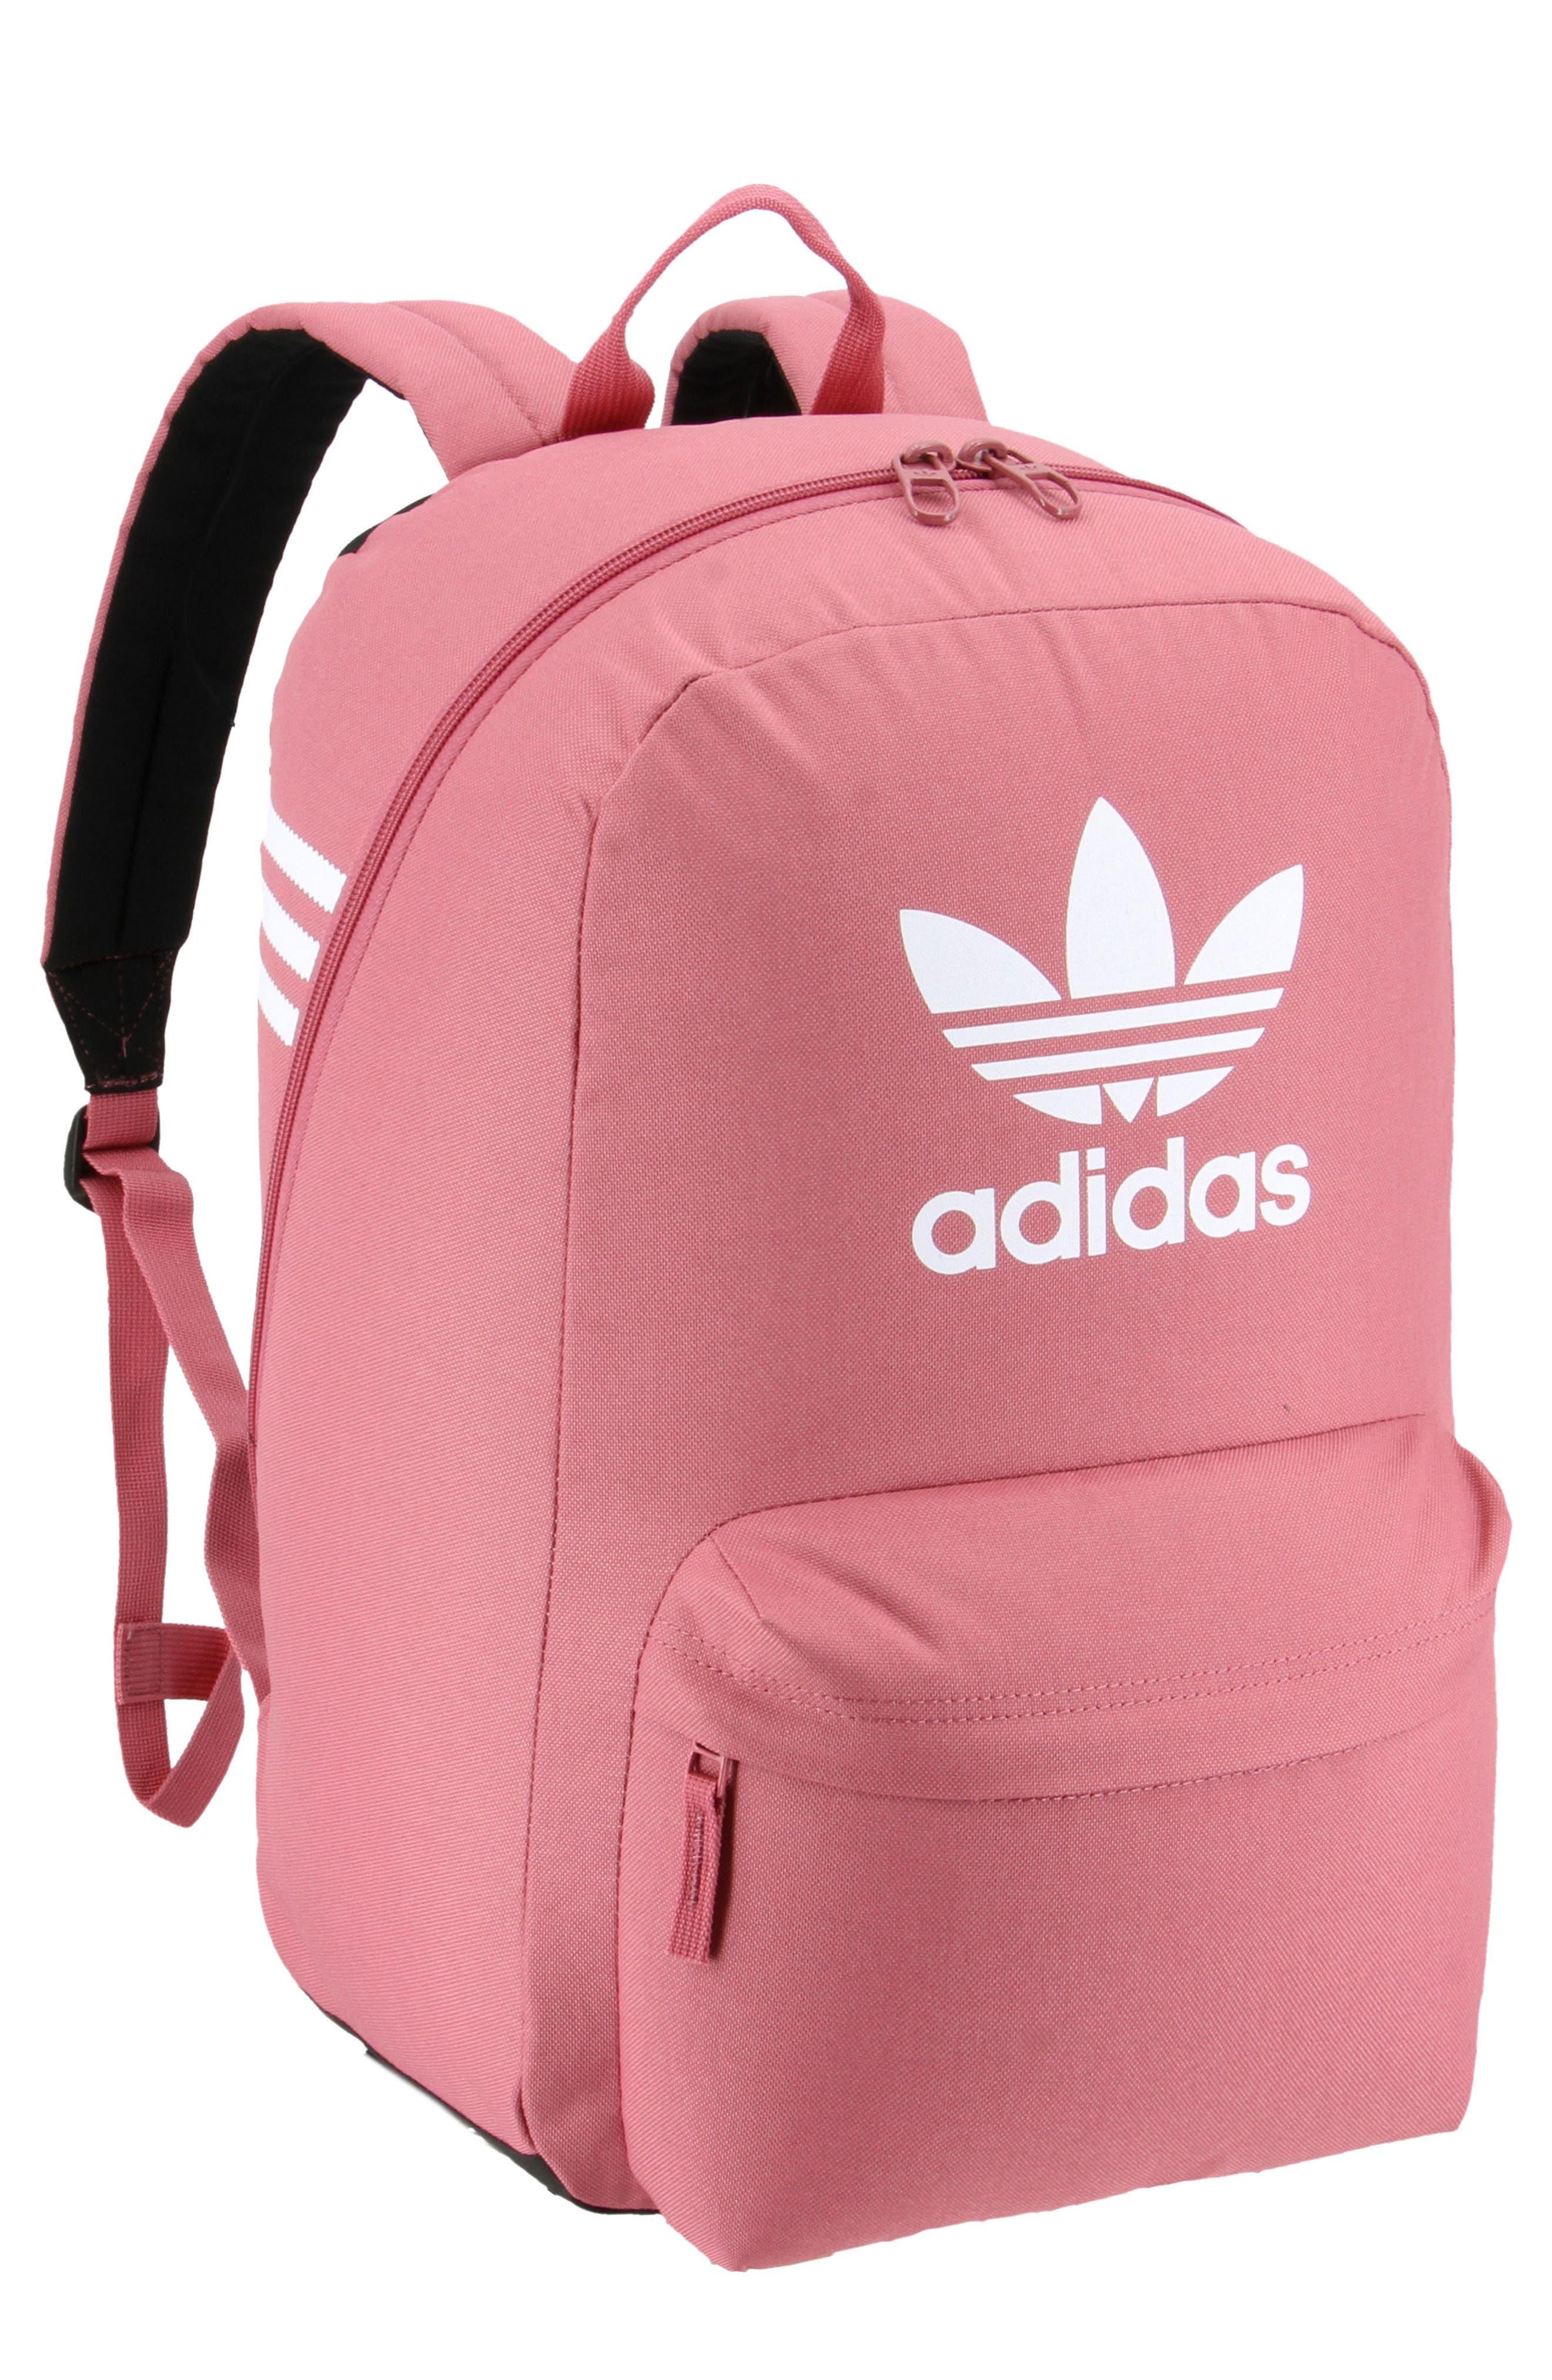 ADIDAS Originals Big Logo Backpack, Main, color, TRACE MAROON